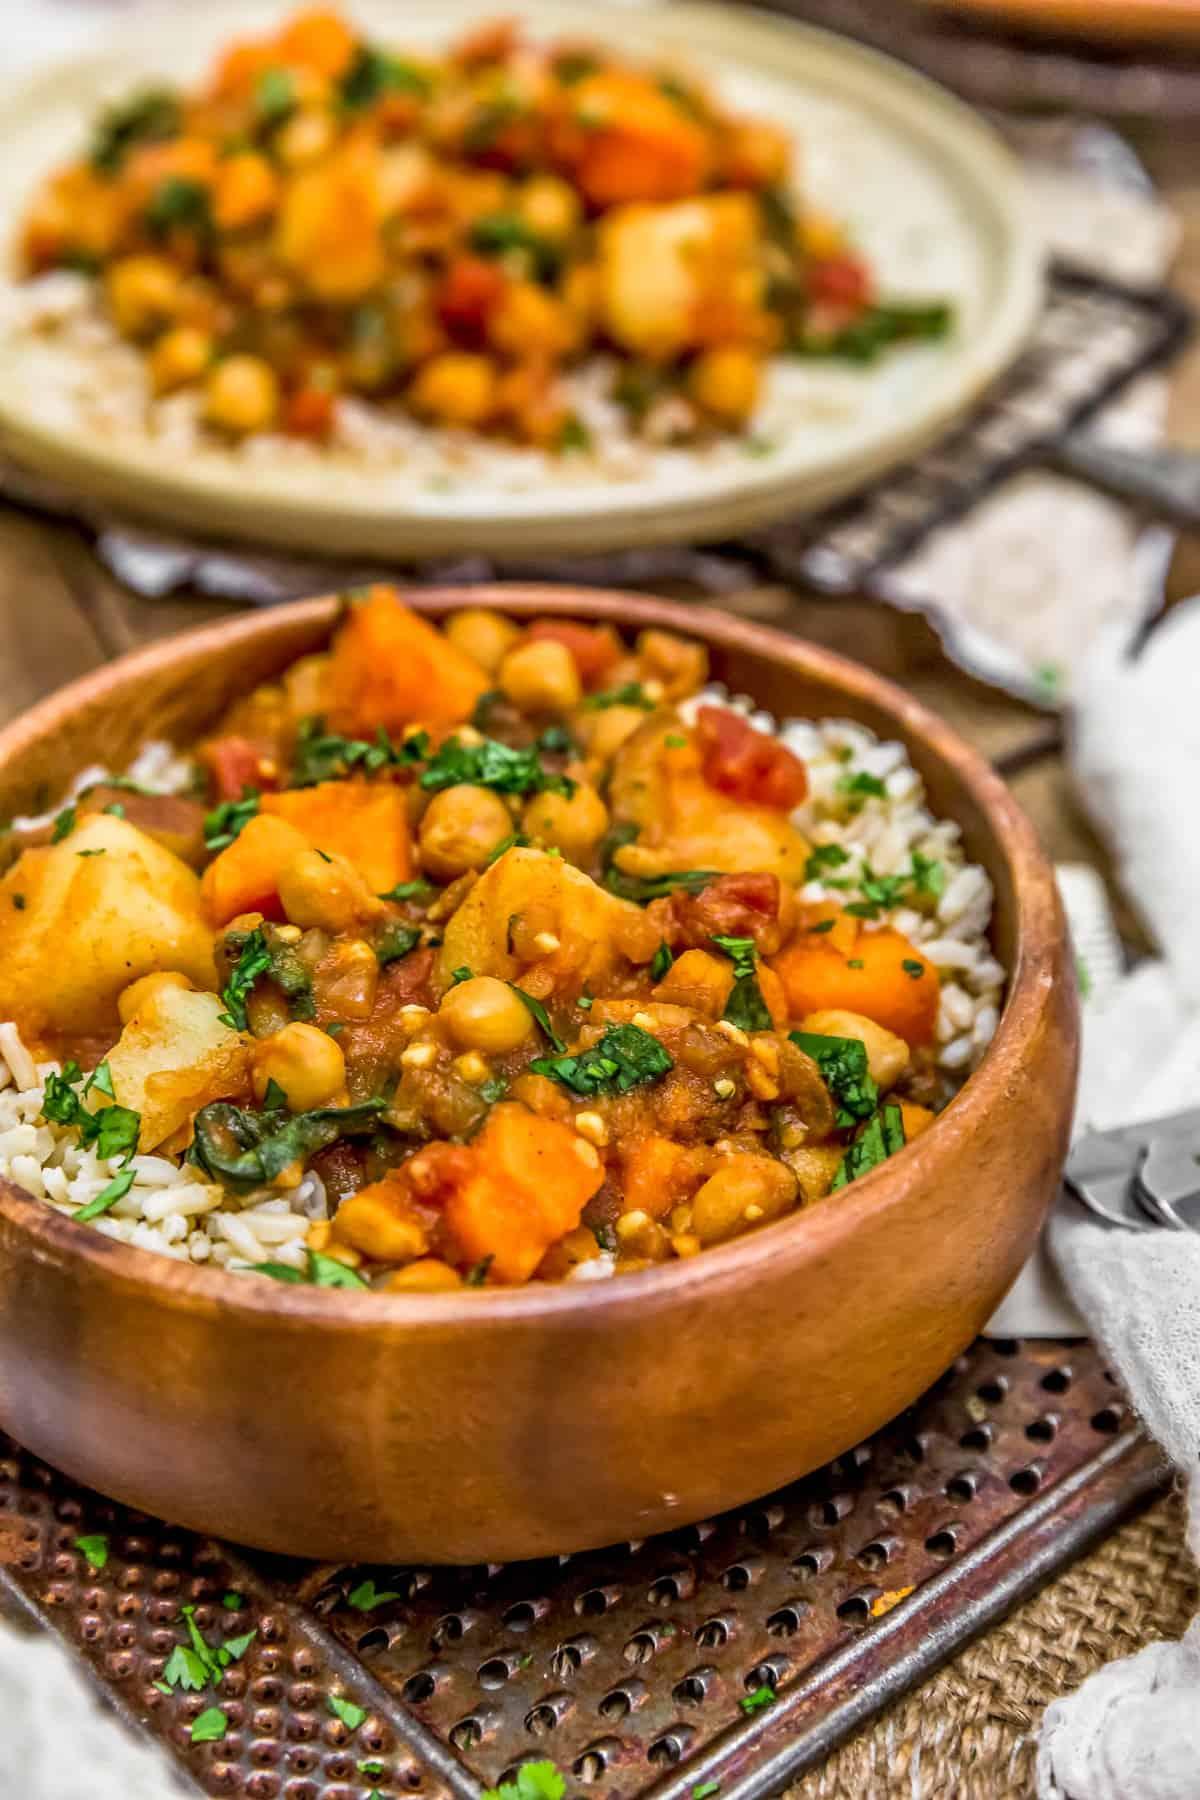 Bowl of Potato Vindaloo